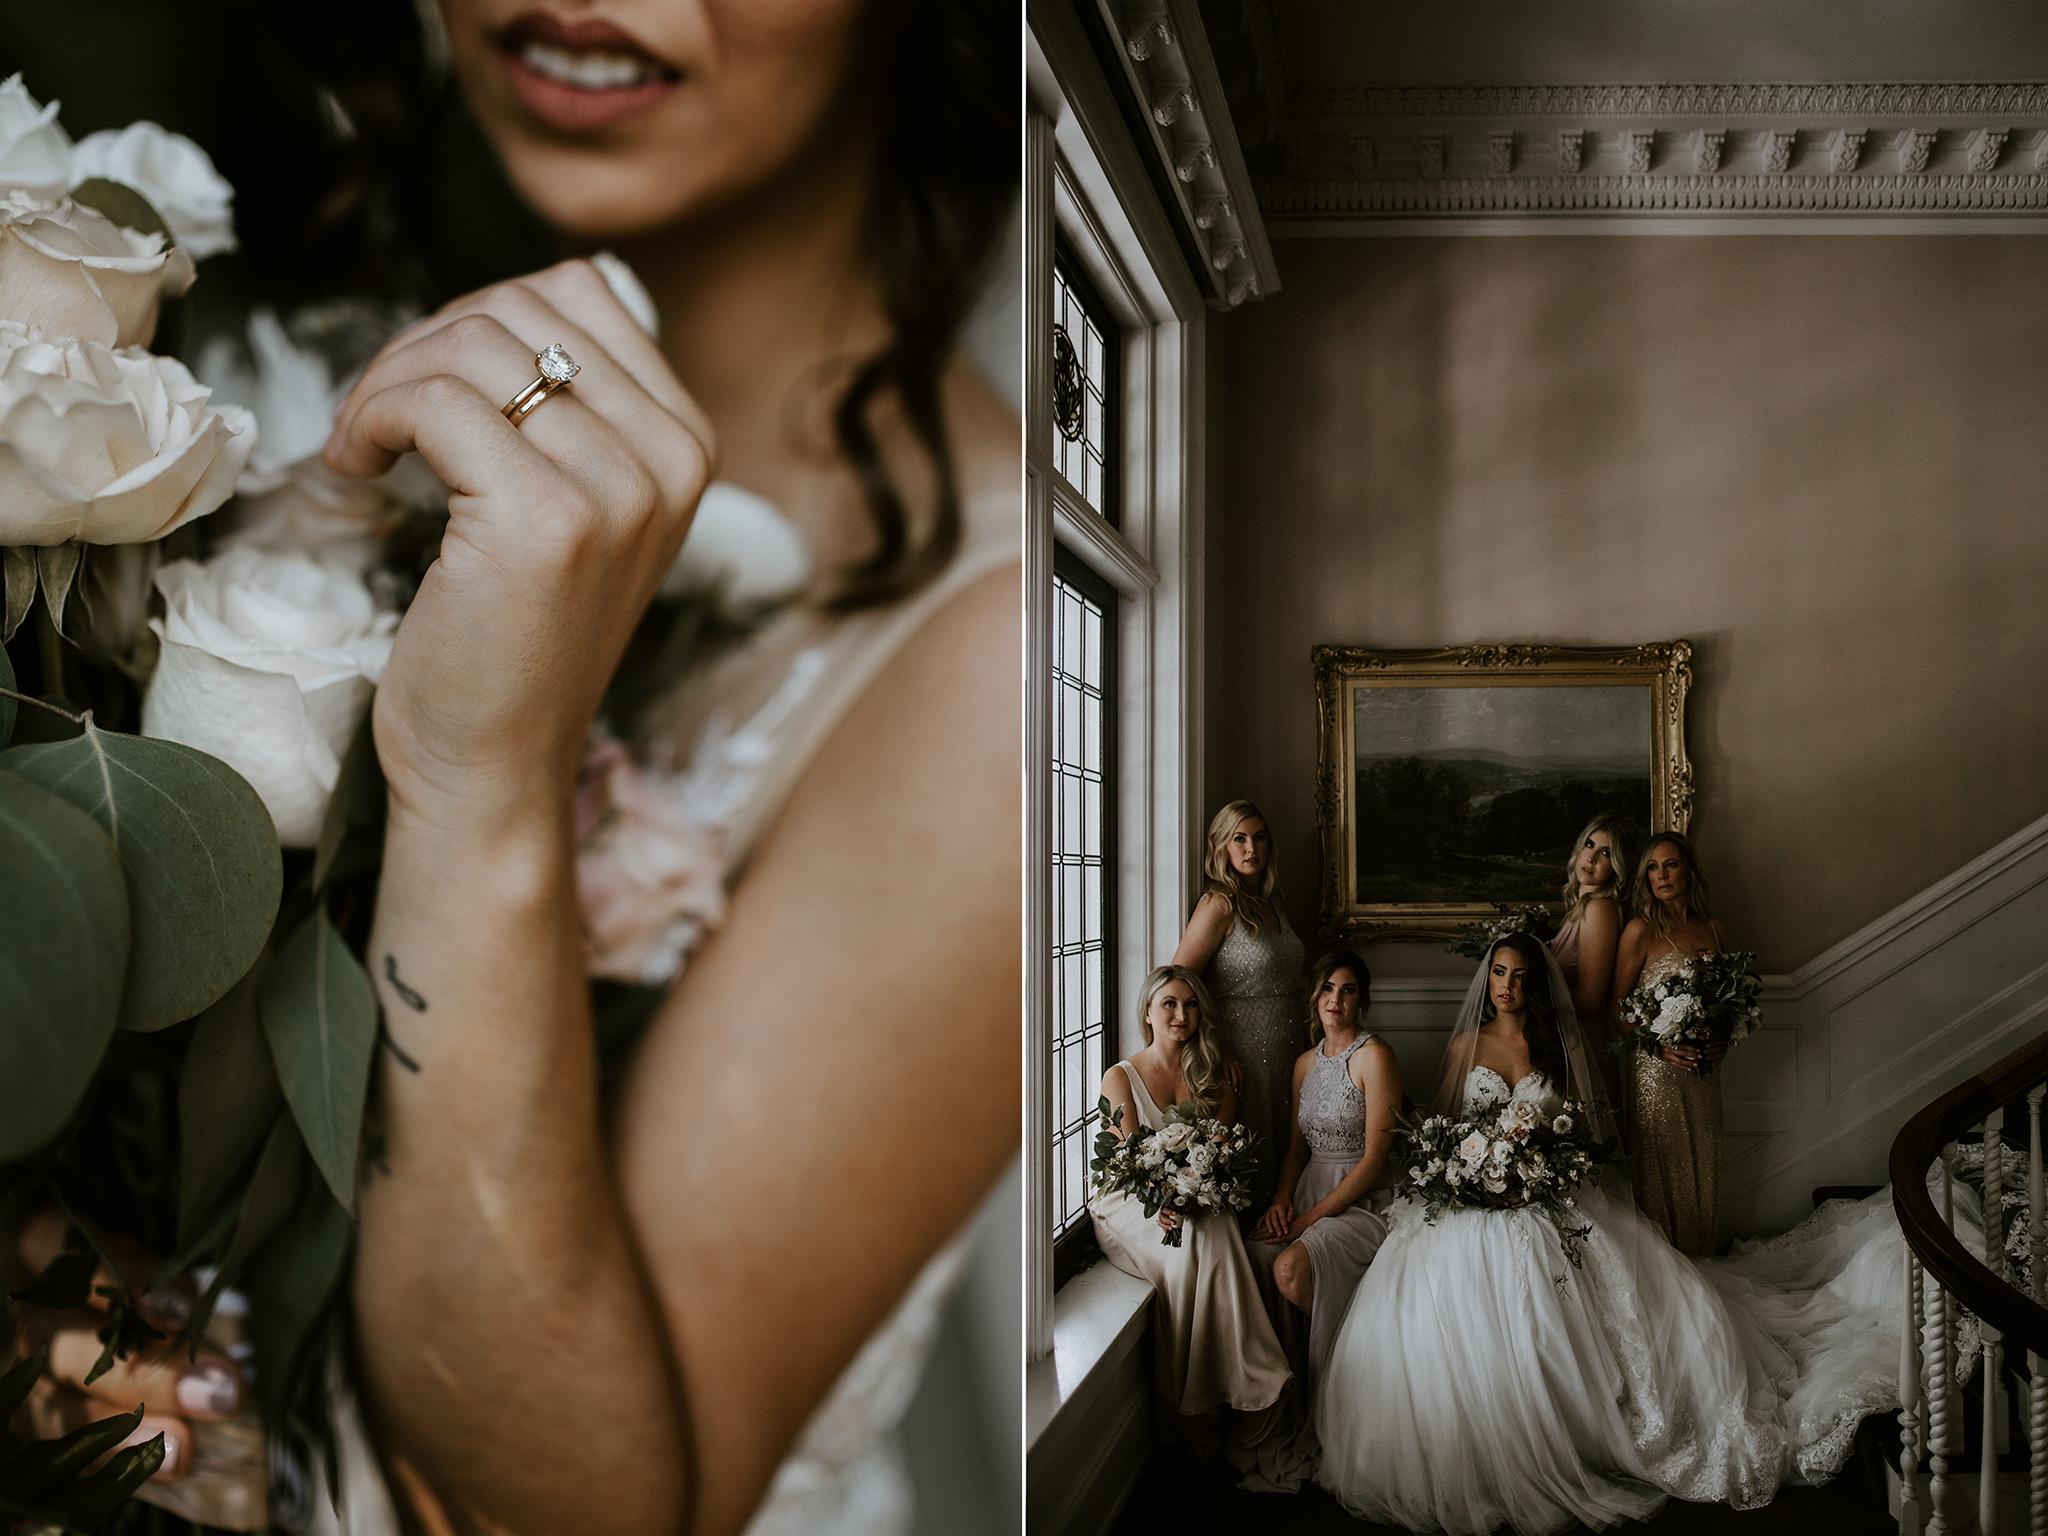 ang-weddings.jpg